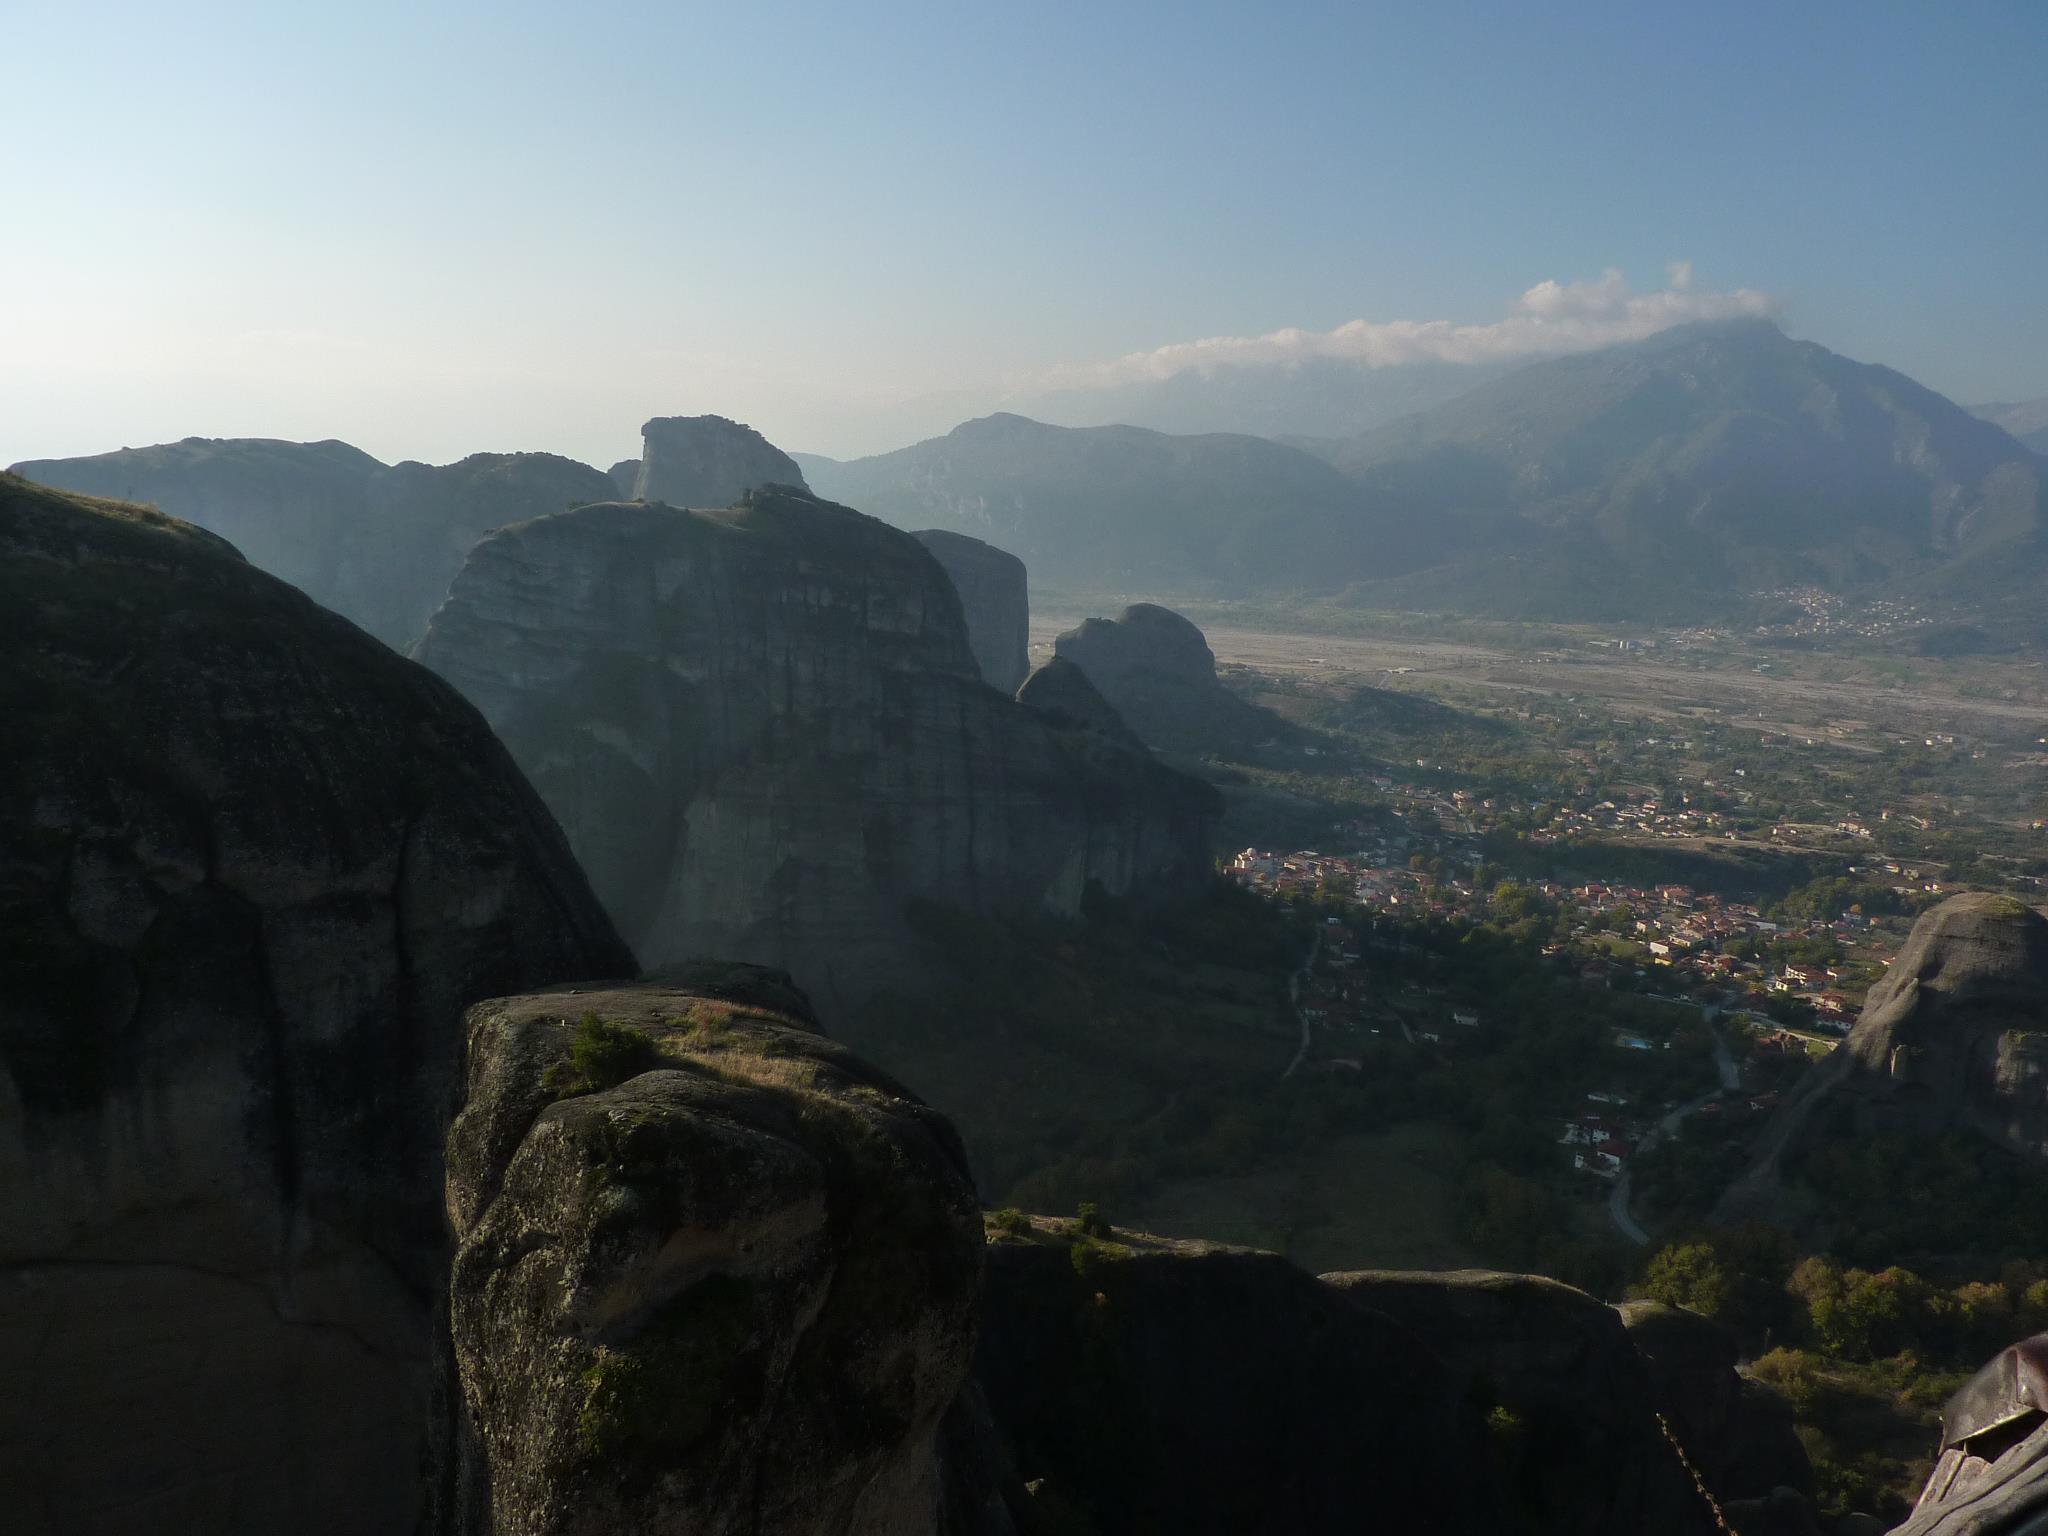 Kastraki village below in the great Thessaly plain